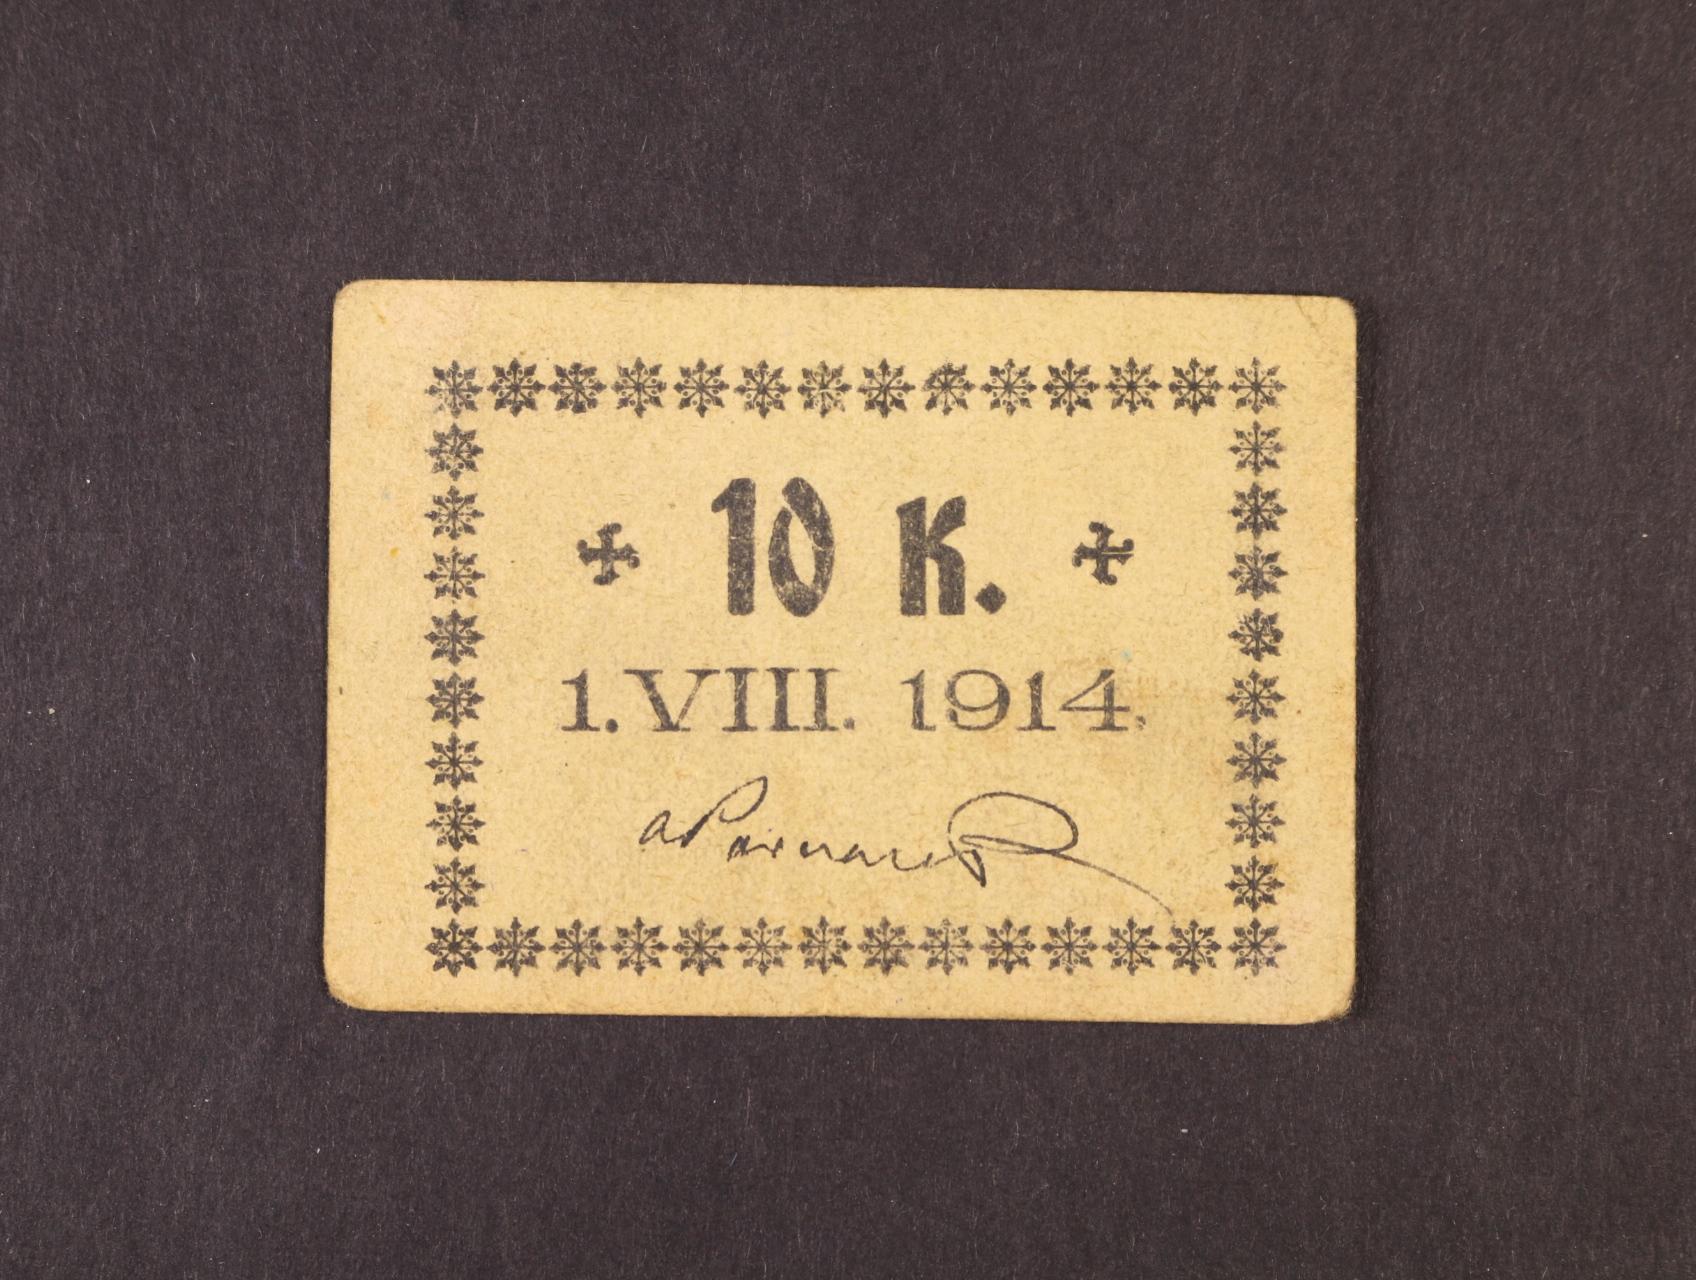 Kalisz, 10 kop. 1914 Magistrat, Rj. R-26985